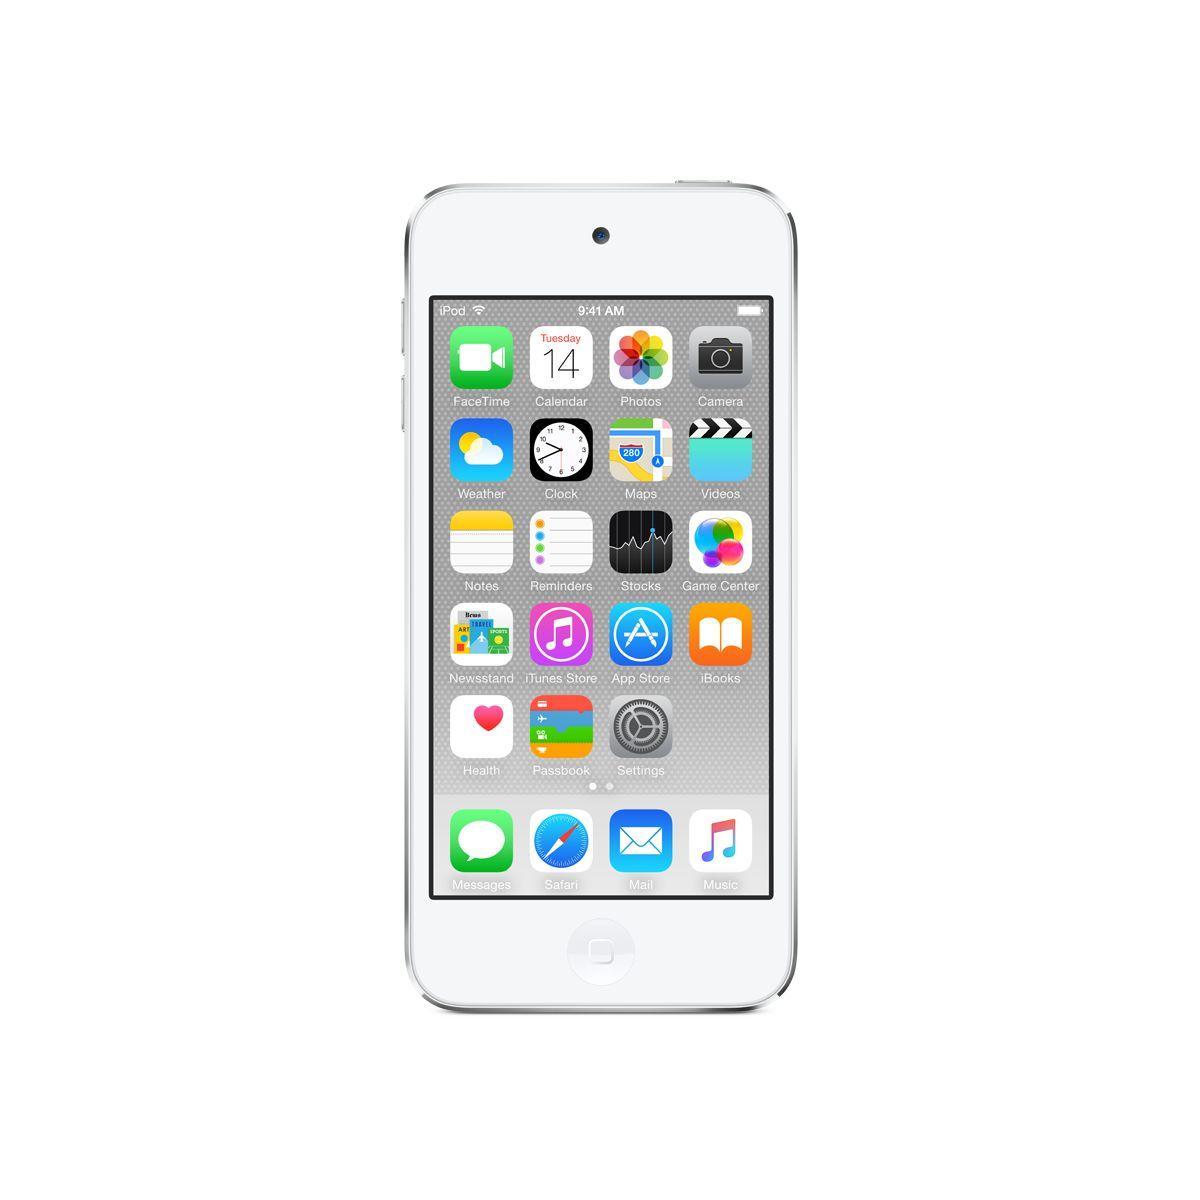 Bal.mp4 apple ipod touch 128gb silver - livraison offerte : code livdom